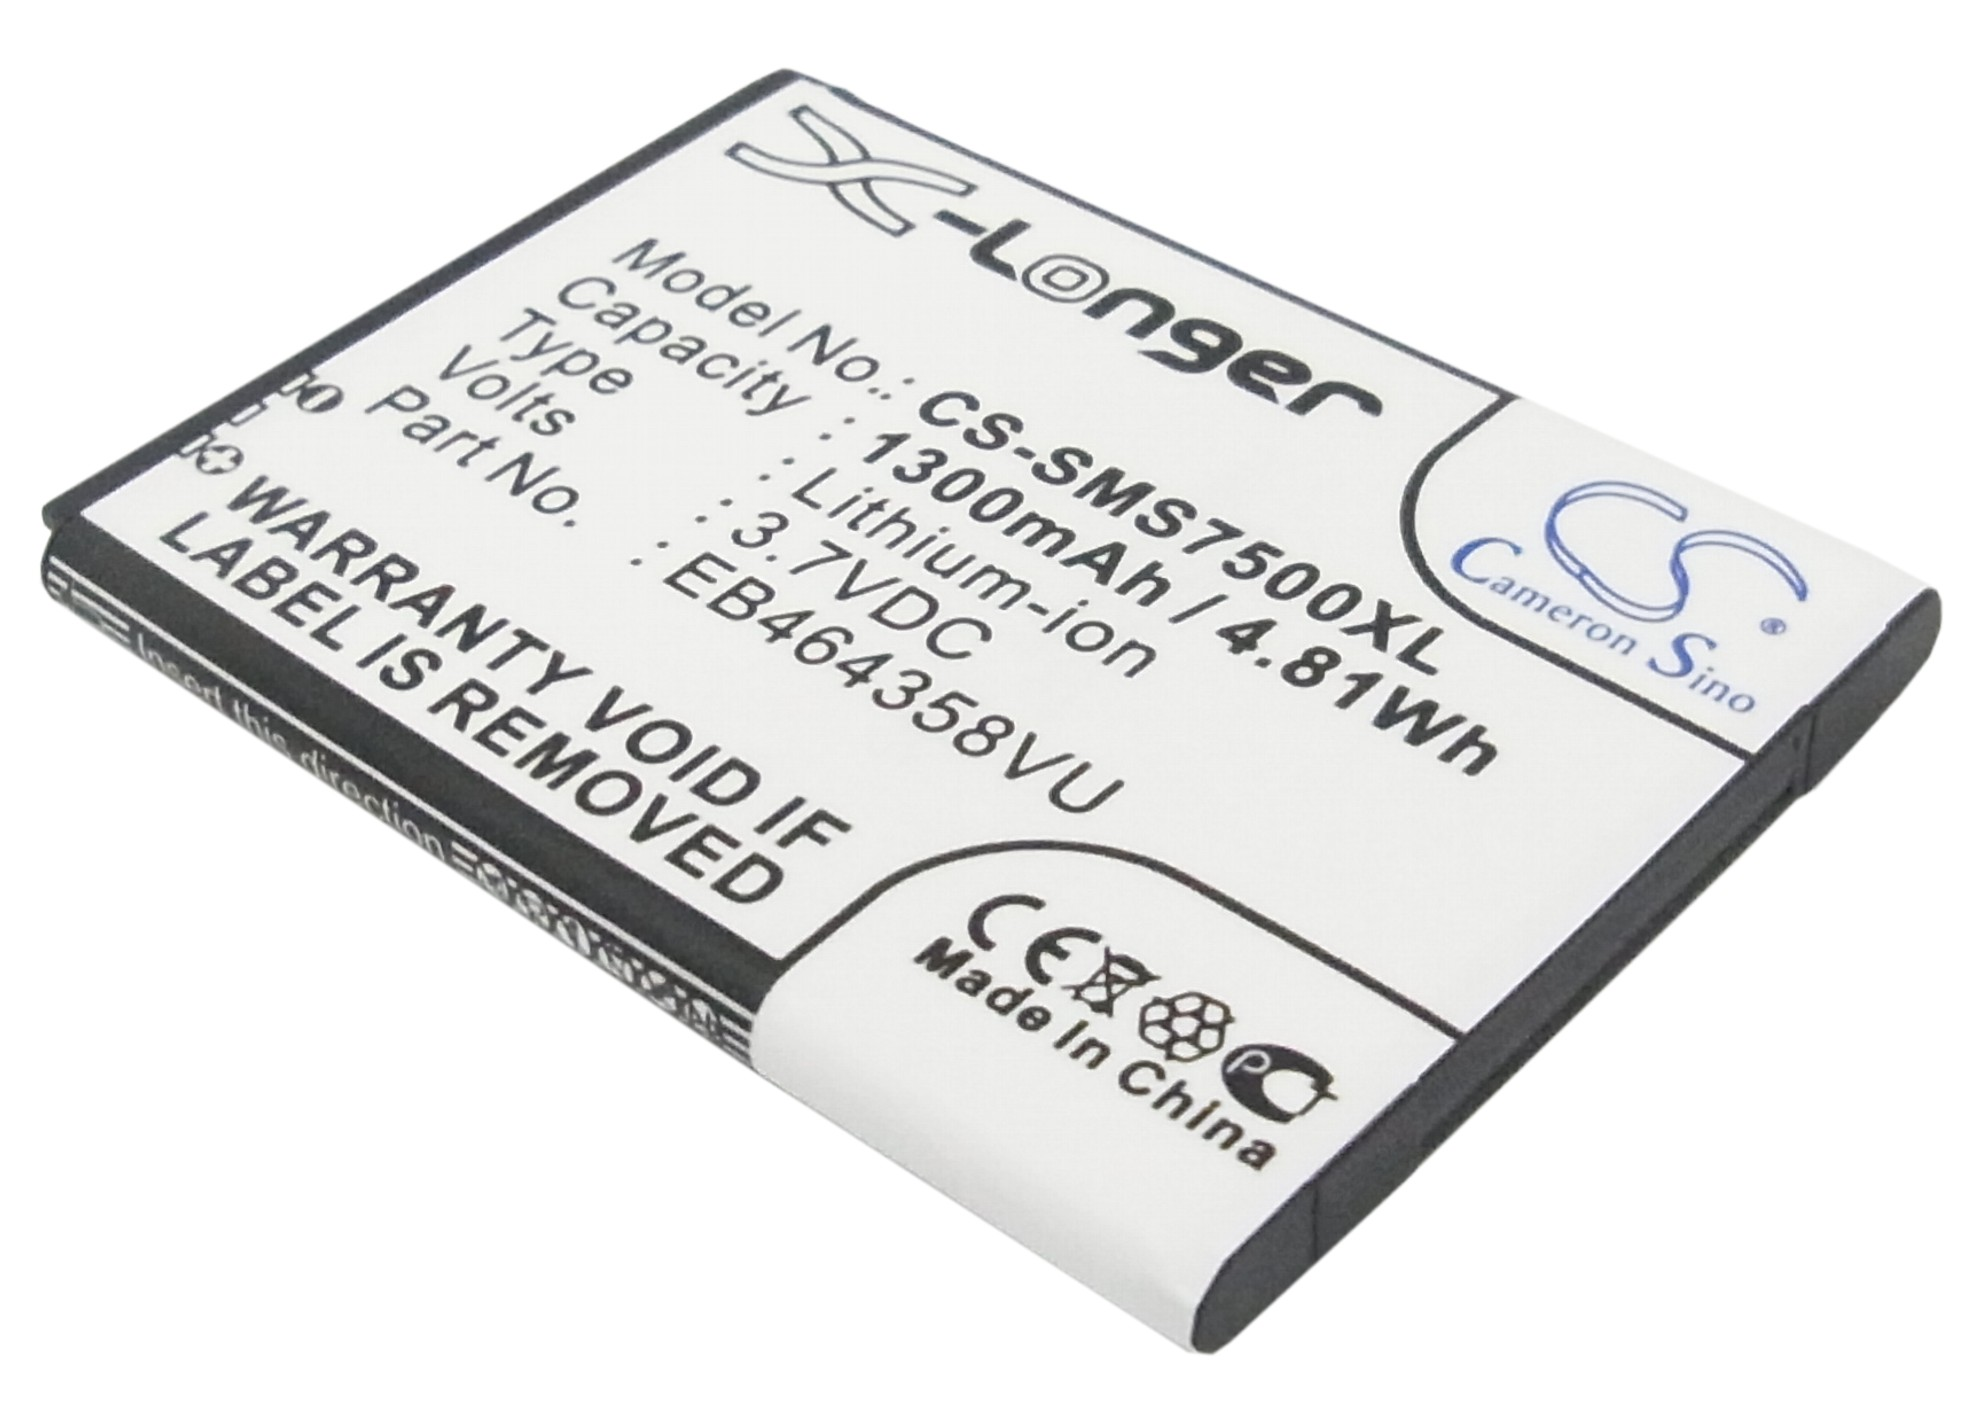 Cameron Sino baterie do mobilů pro SAMSUNG GT-S6310 3.7V Li-ion 1300mAh černá - neoriginální